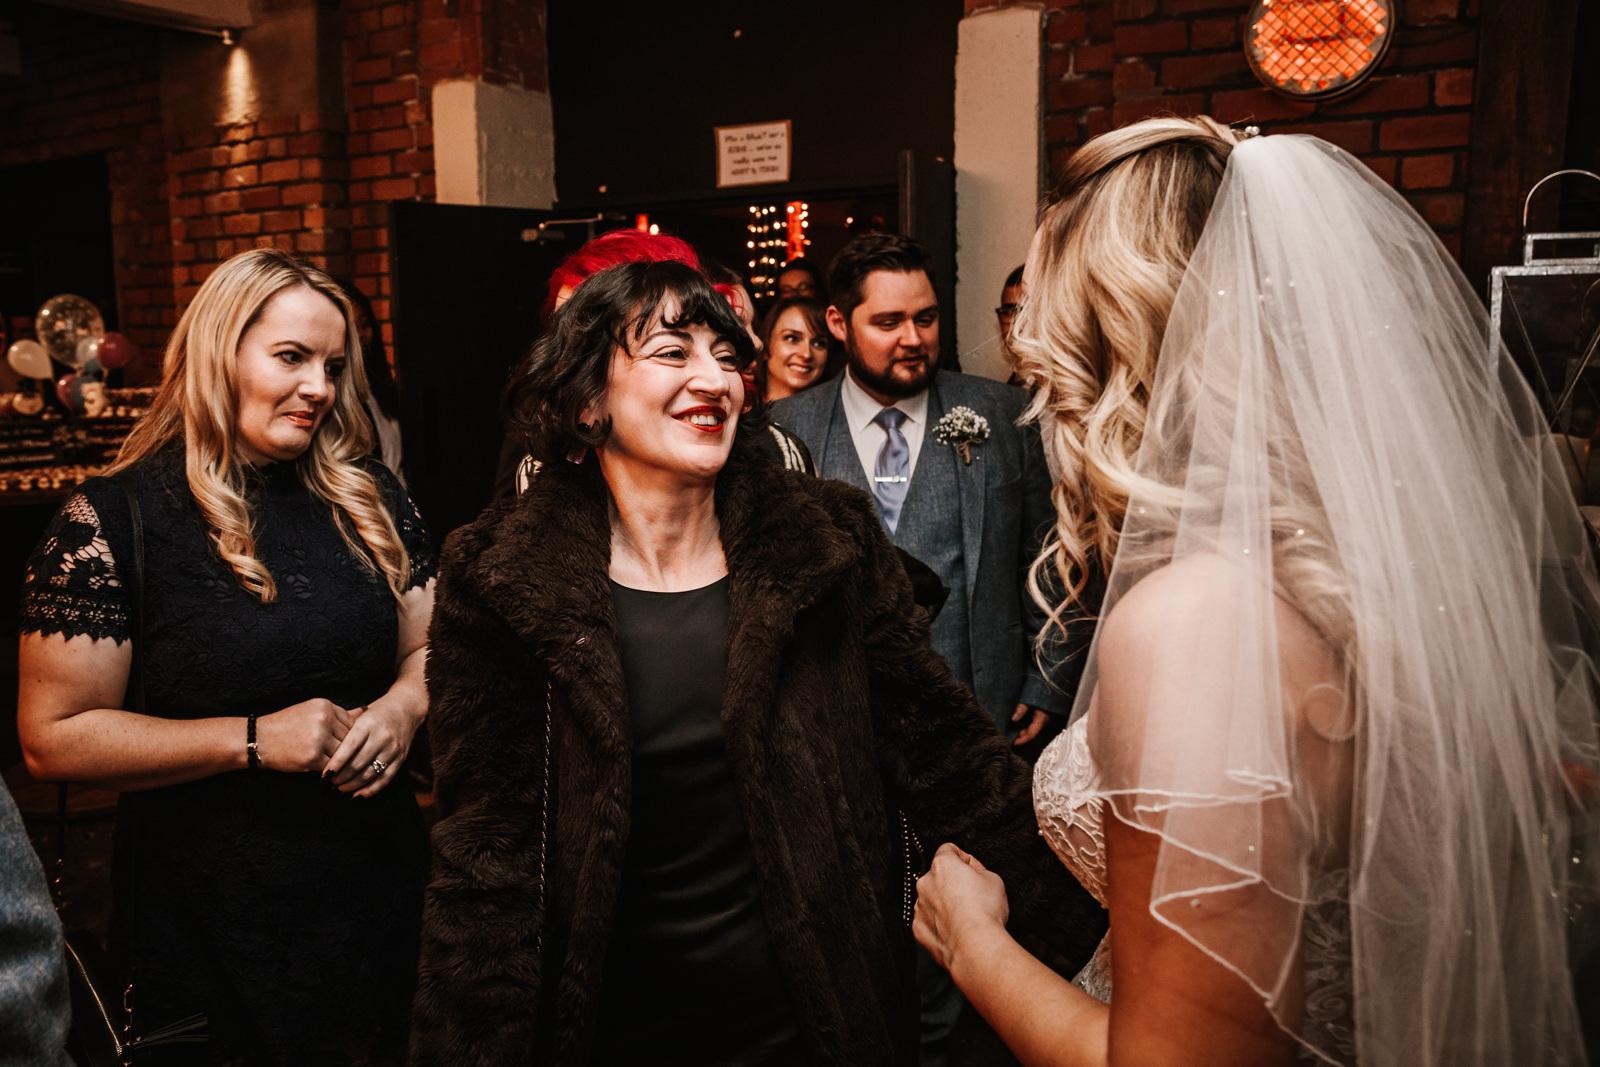 Wedding guest congratulates the bride